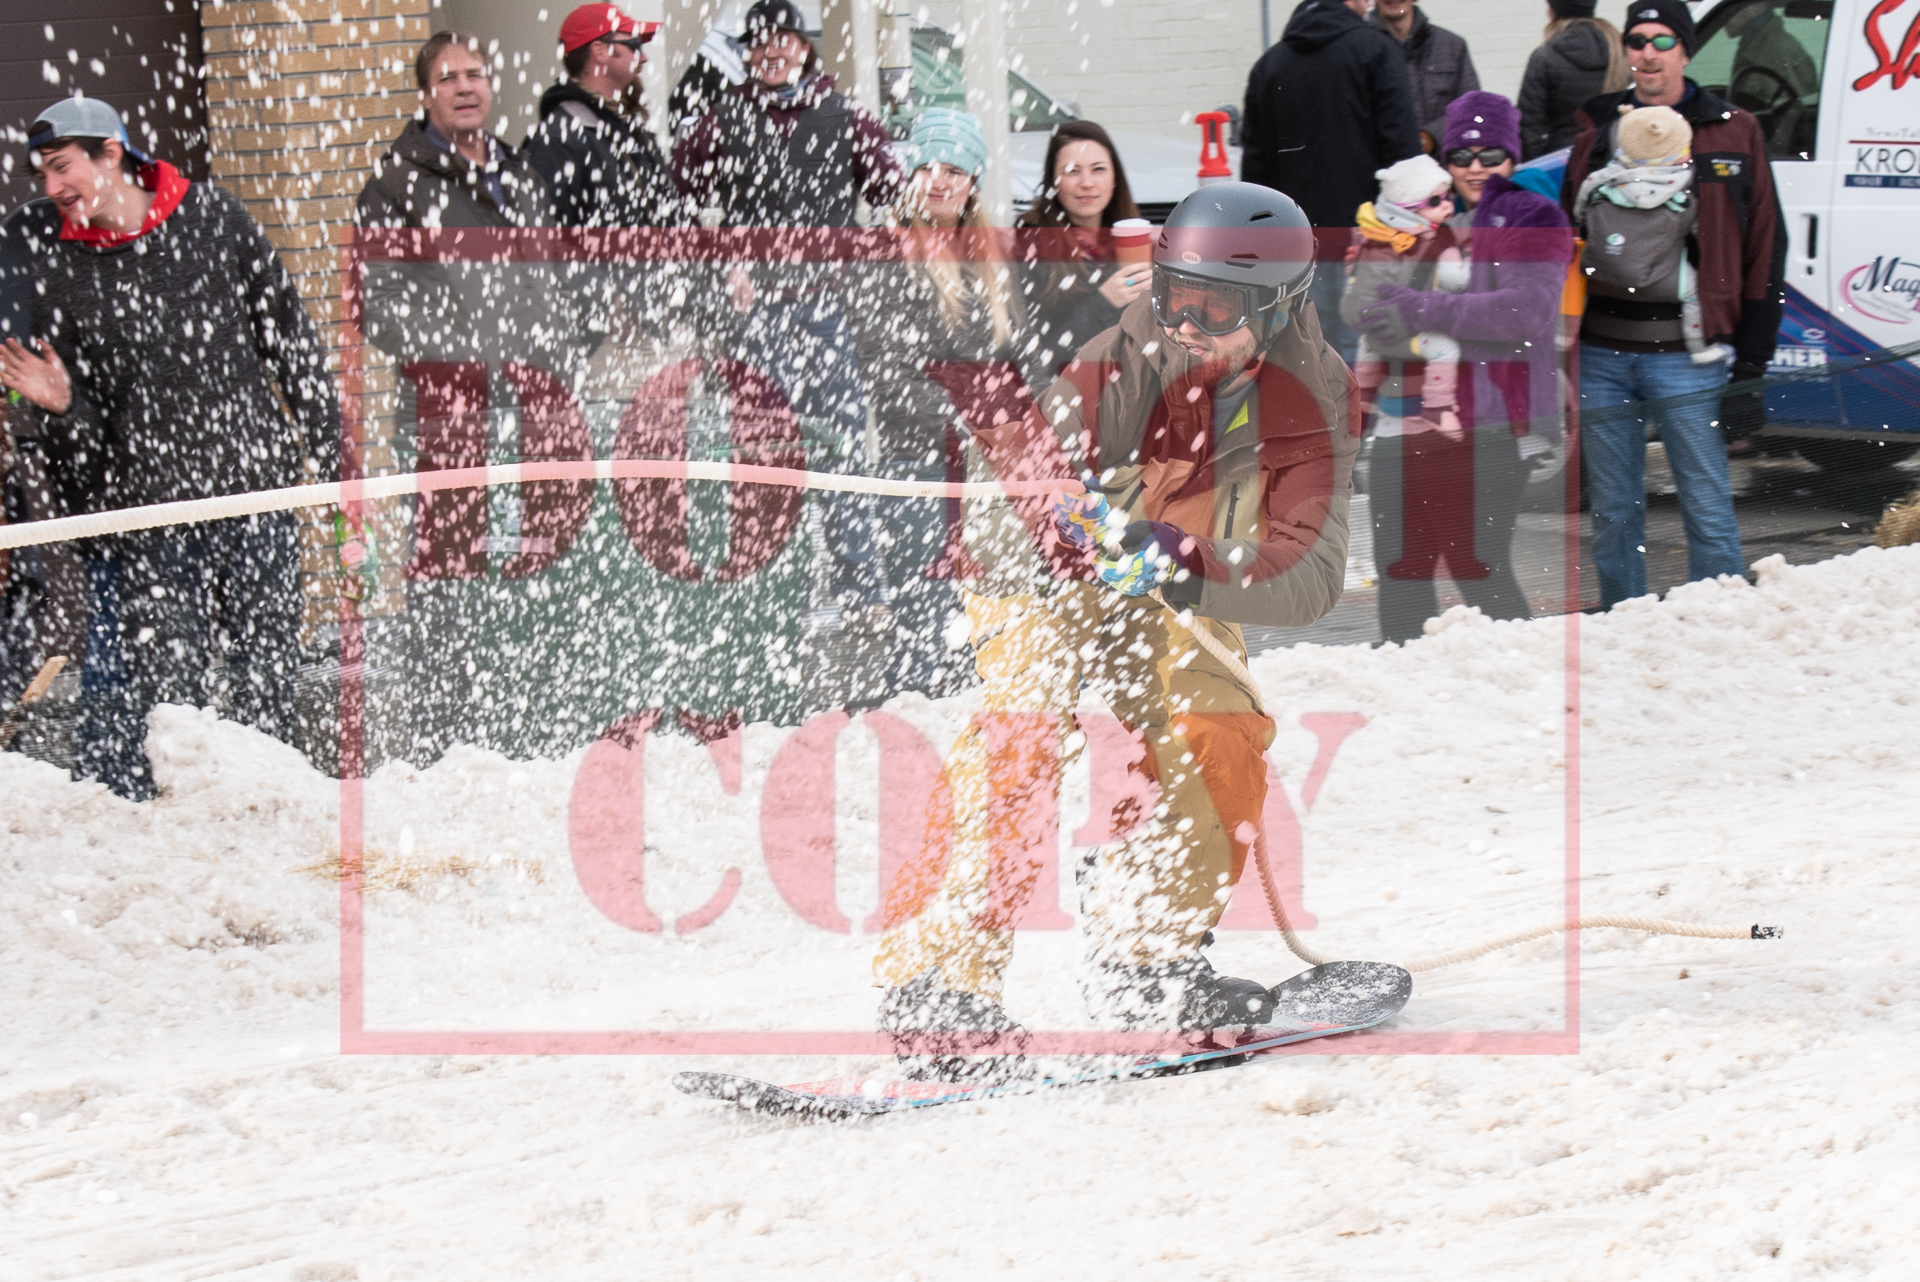 - Chris Sorenson - Snowboard 5